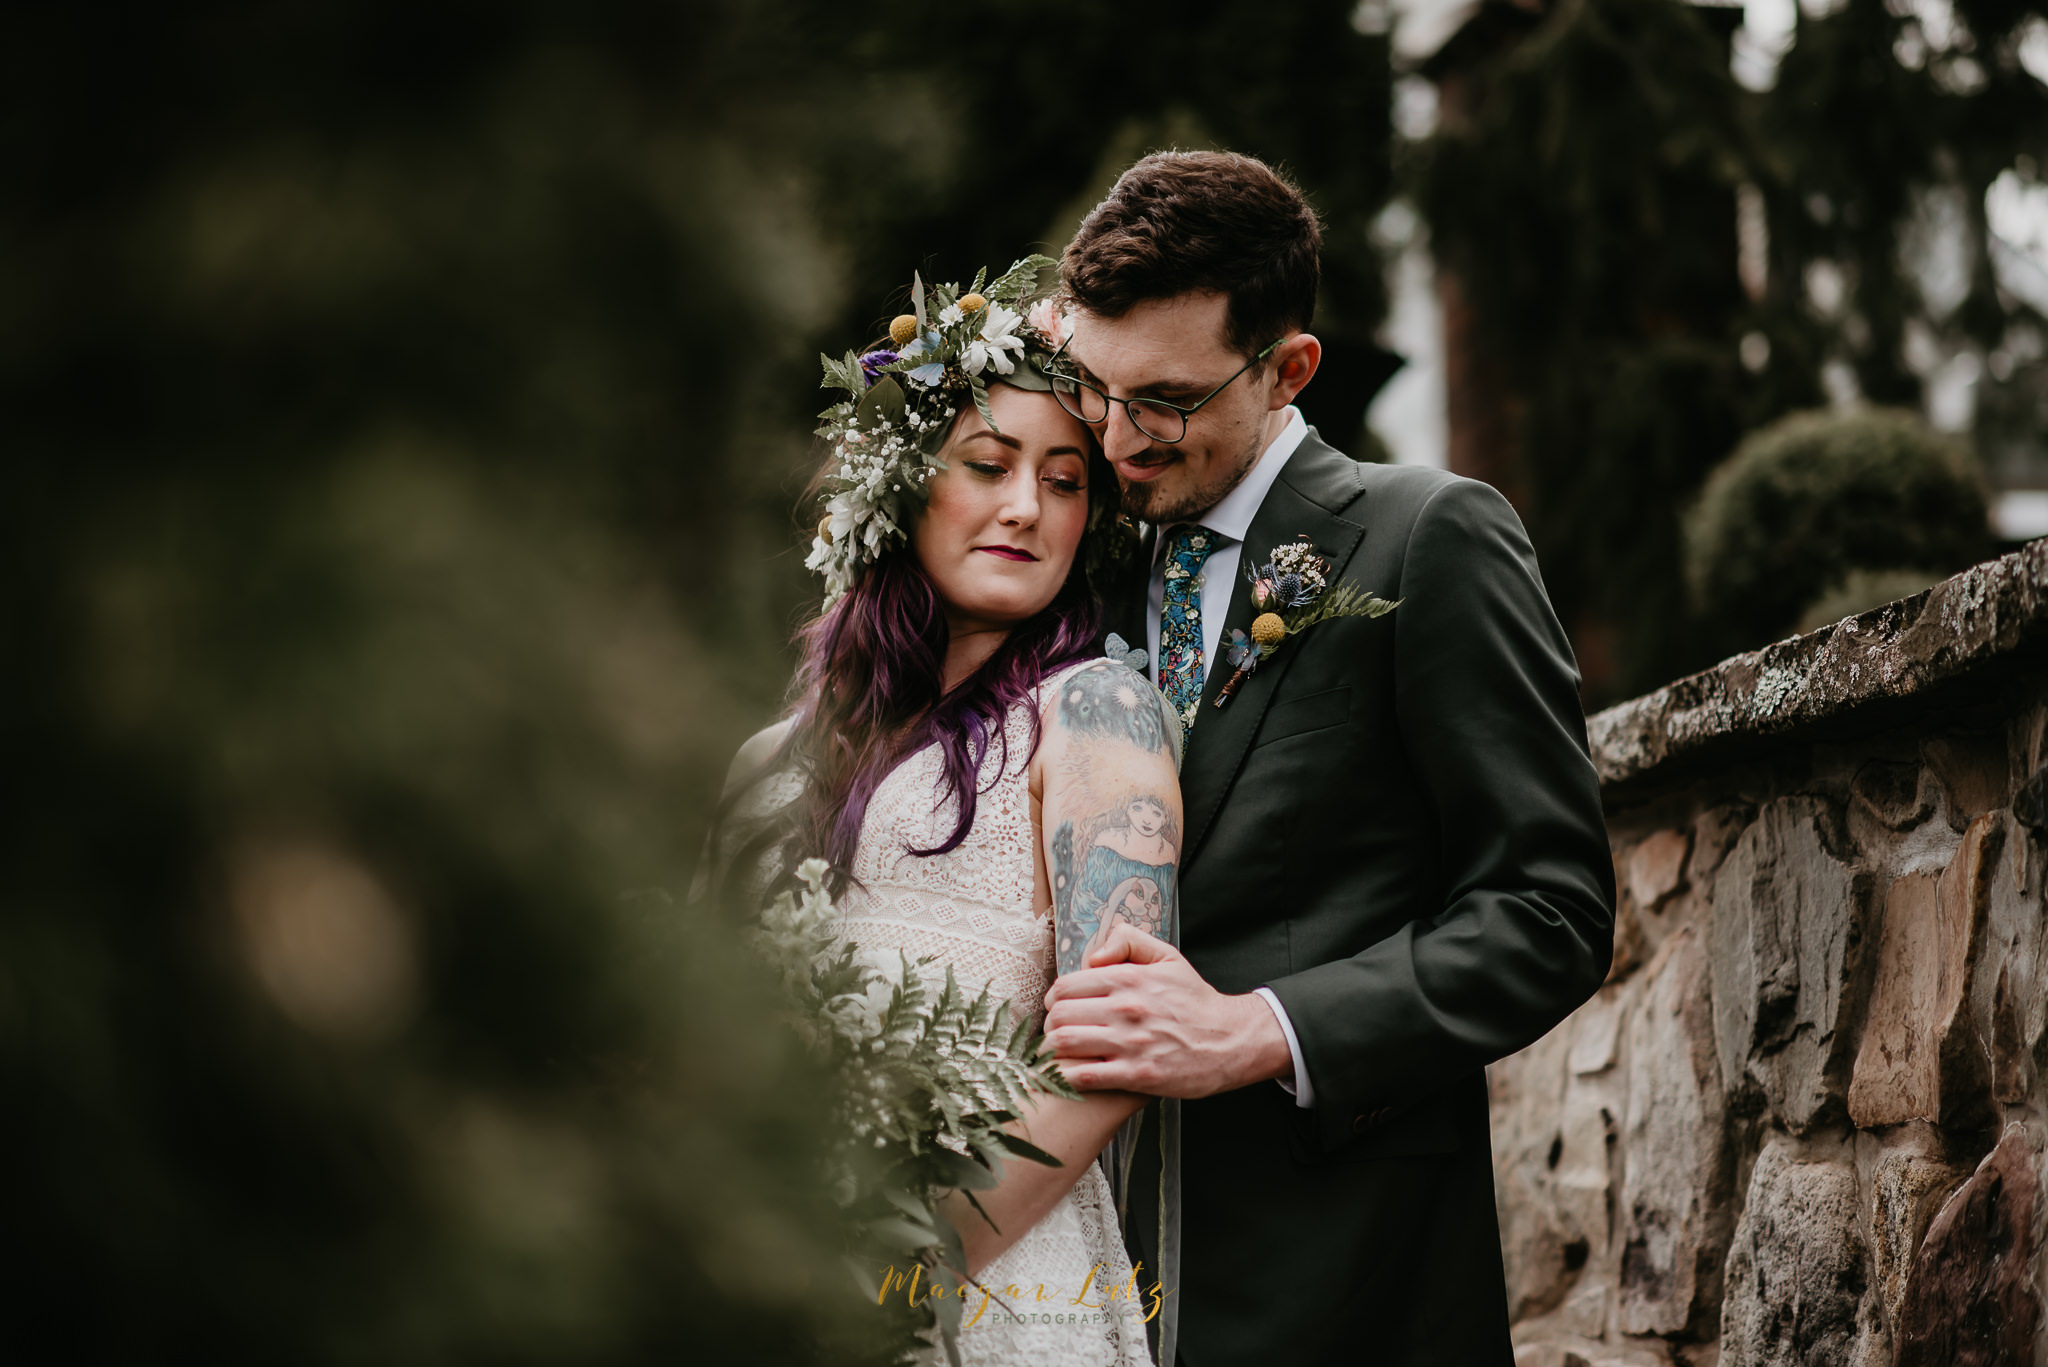 Devin & Alex - Wedding at The Beaumont Inn